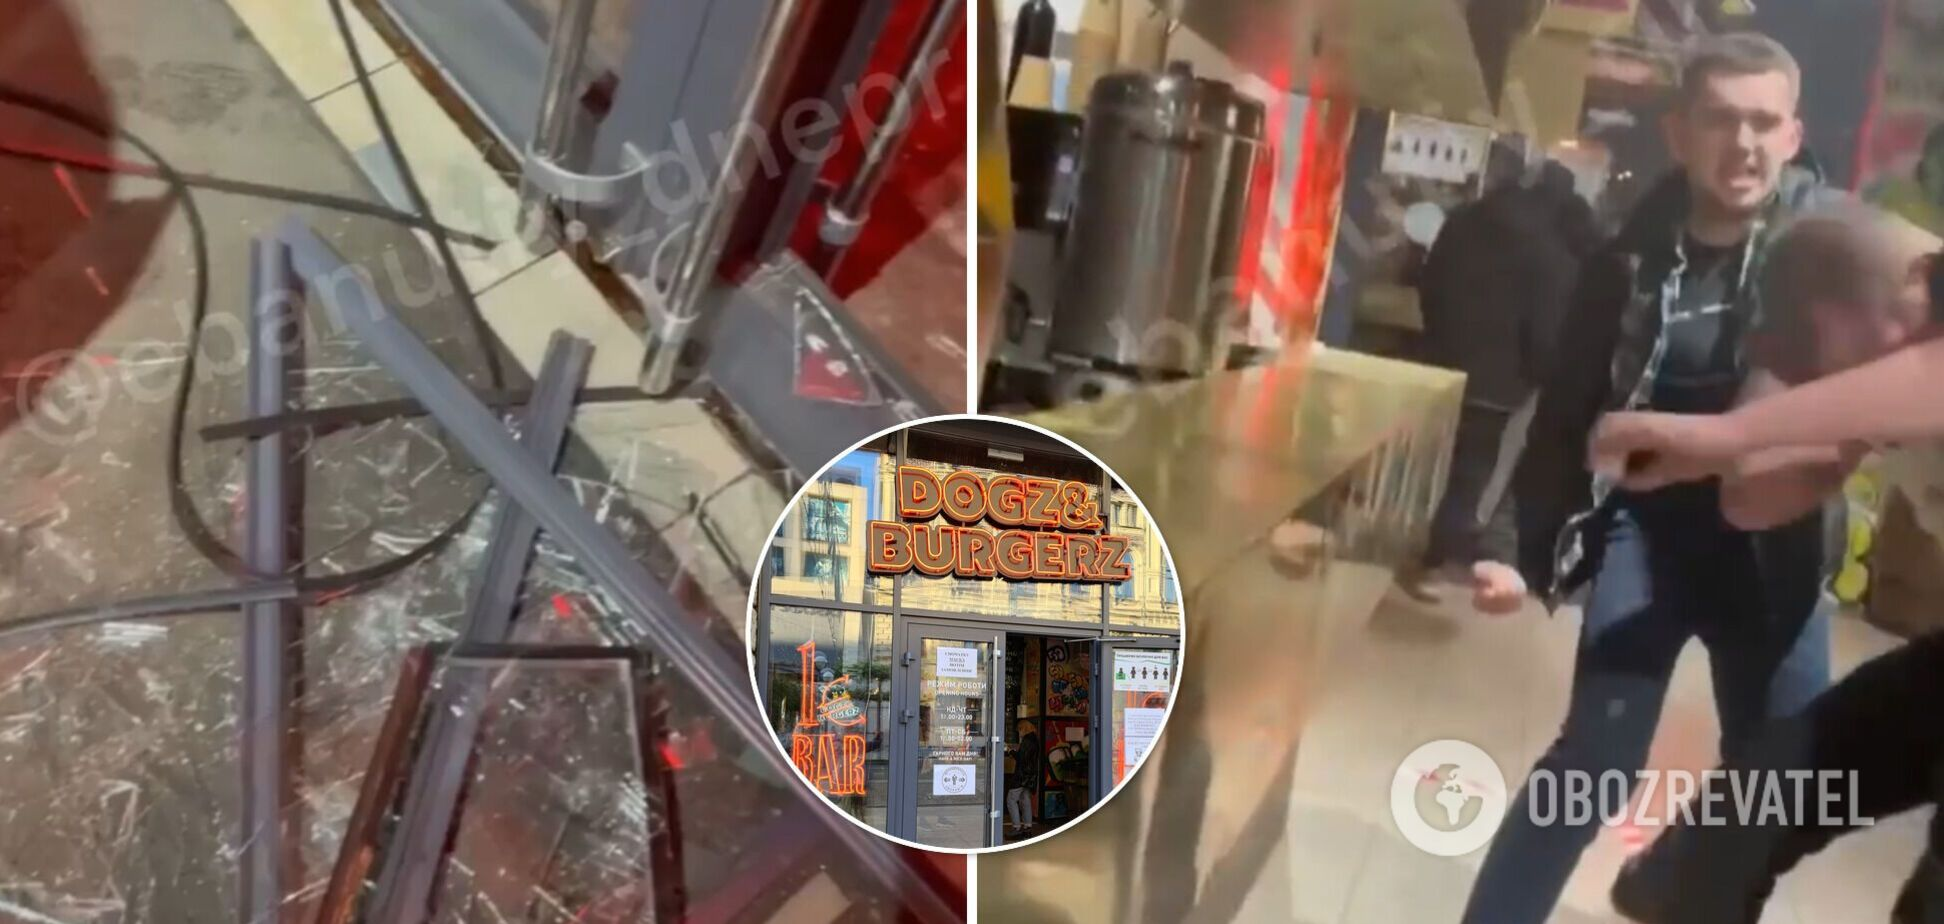 Догз Бургерс Днепр драка видео